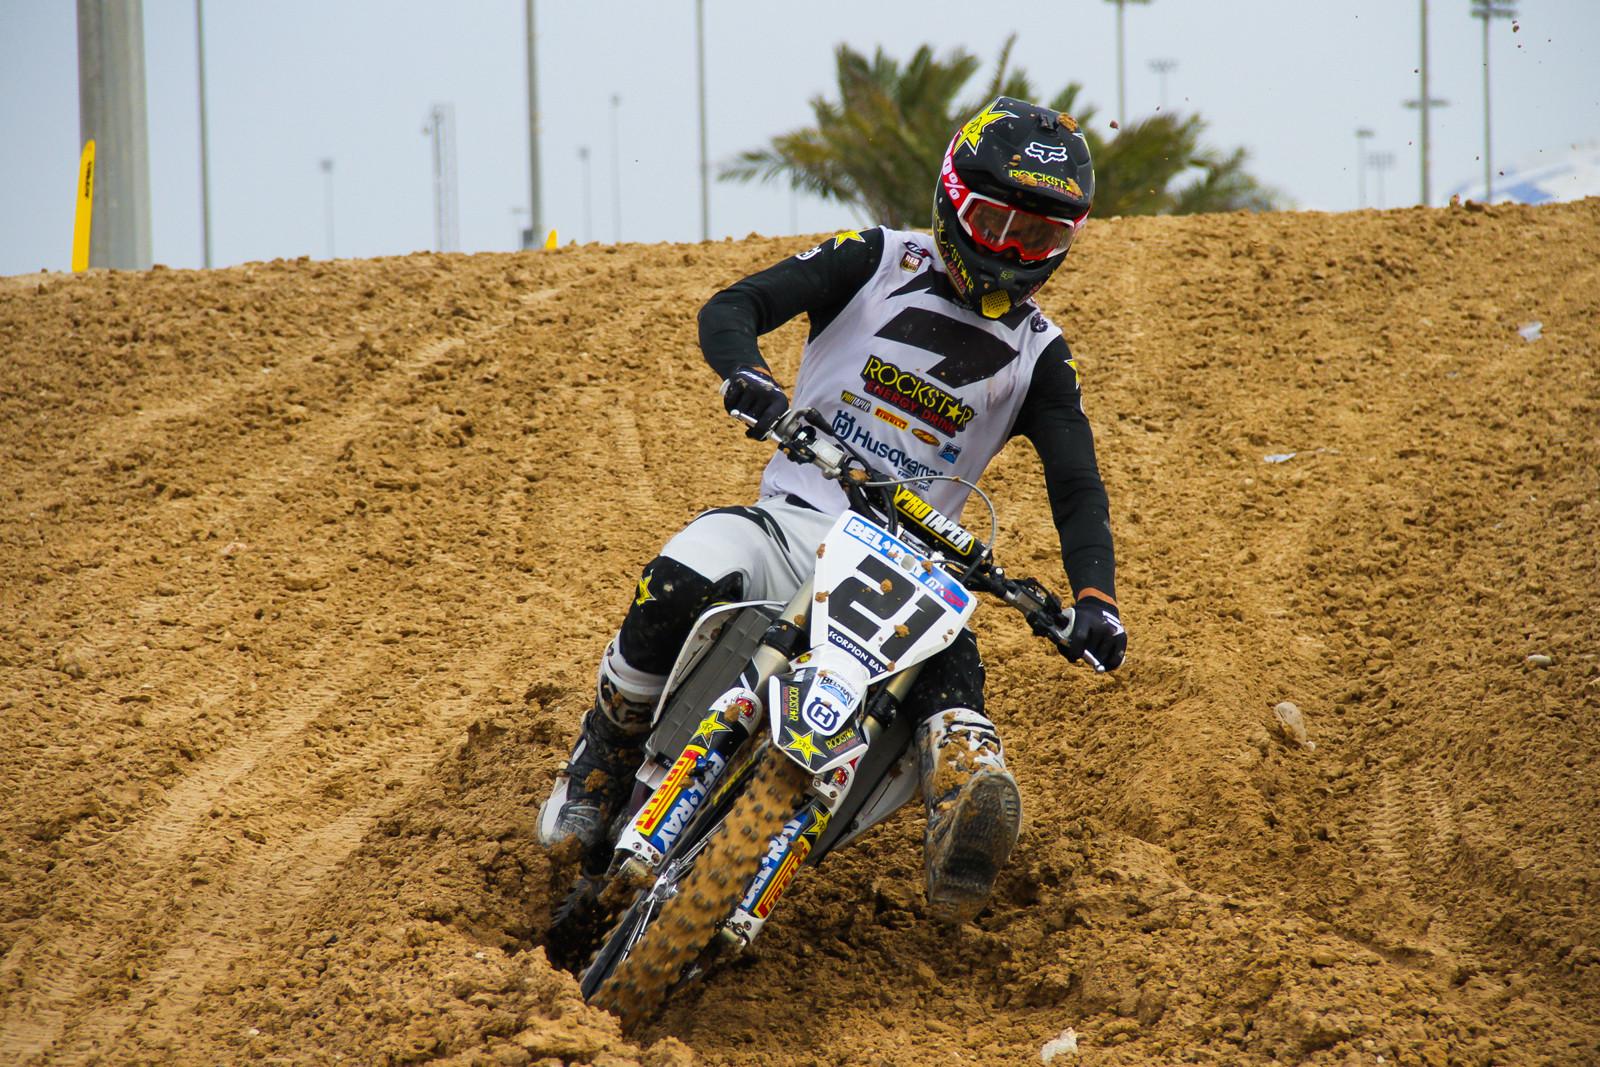 Gautier Paulin - Photo Blast: 2017 MXGP of Qatar - Motocross Pictures - Vital MX